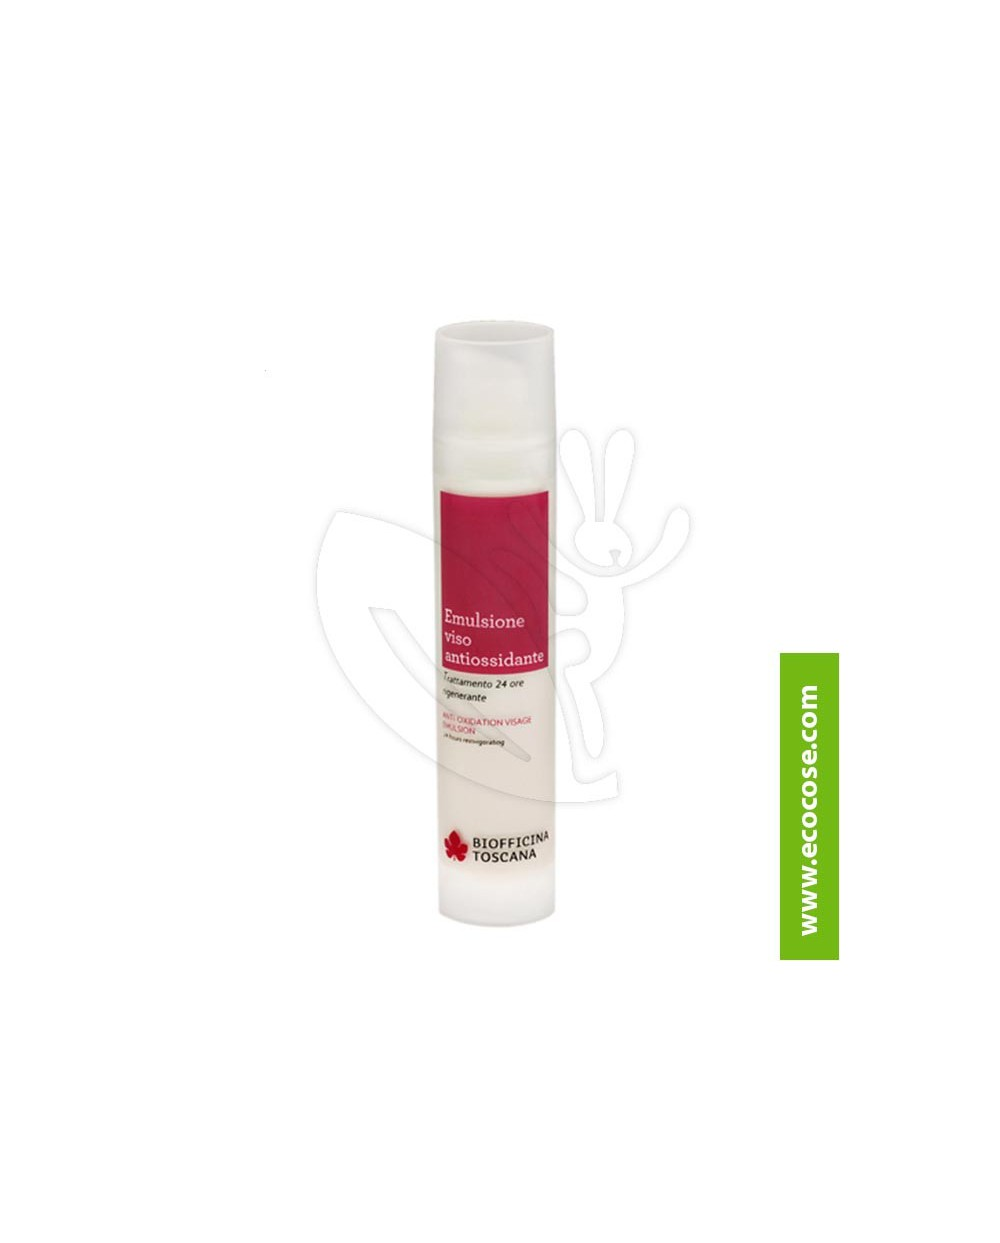 Biofficina Toscana - Emulsione viso antiossidante NUOVA FORMULA